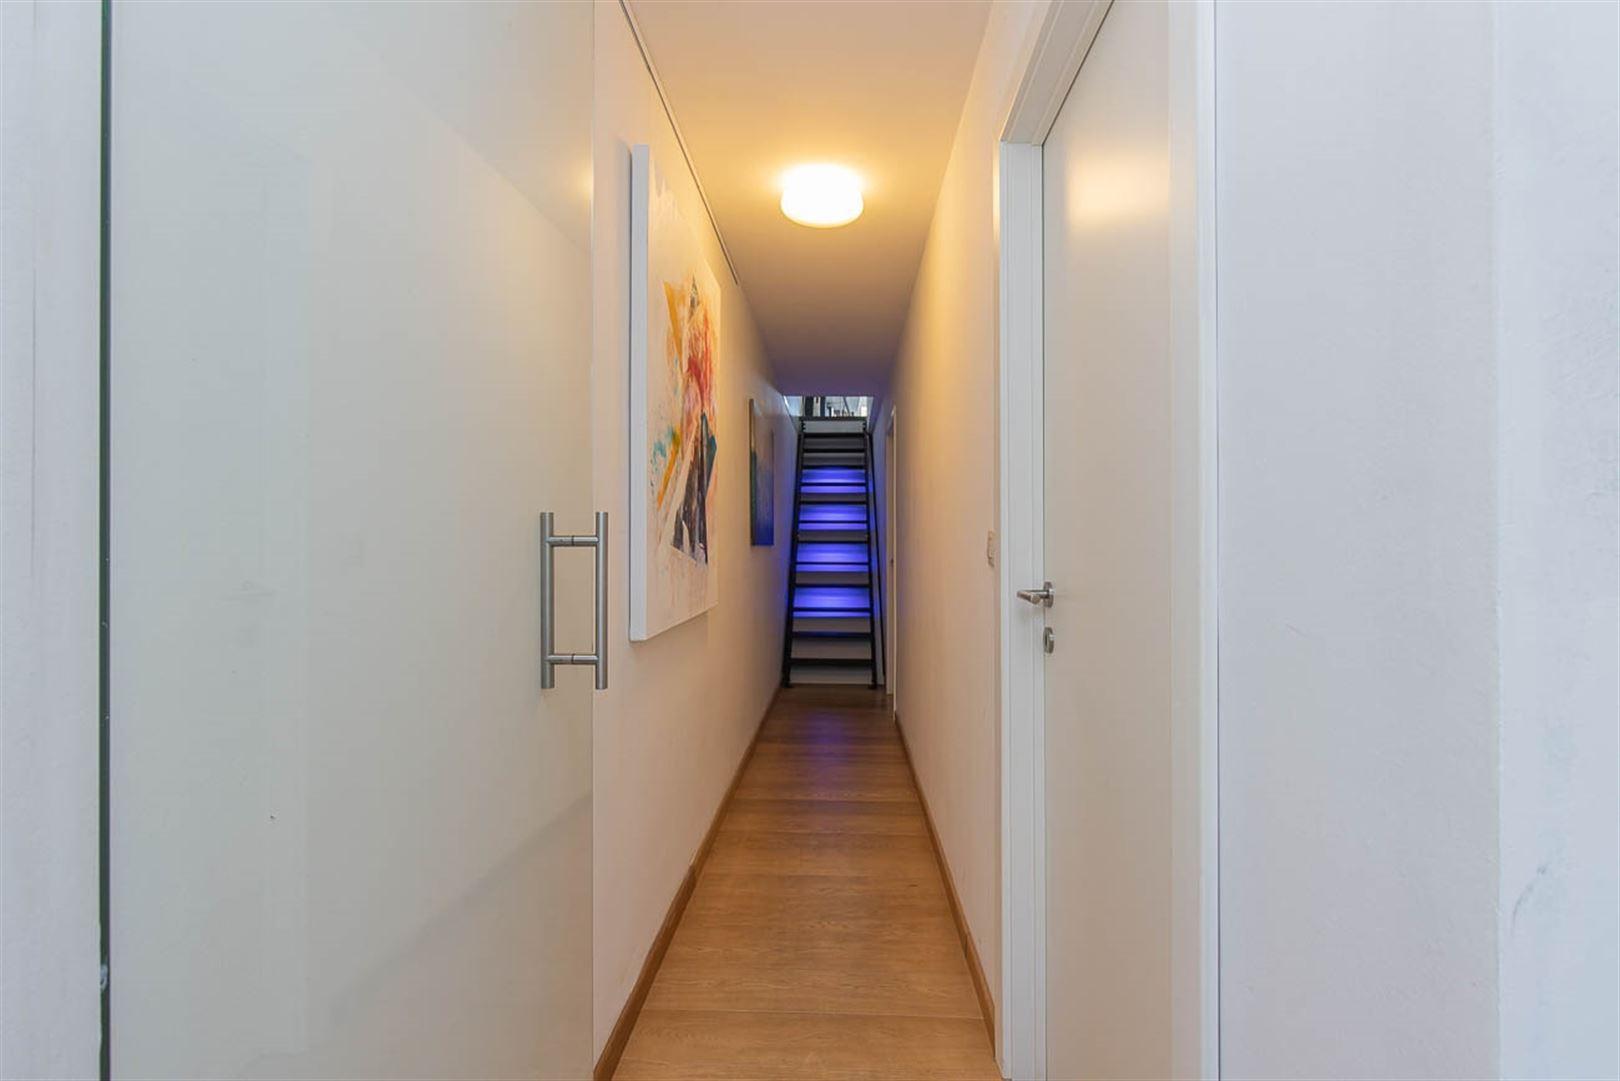 Foto 26 : Duplex/triplex te 9200 DENDERMONDE (België) - Prijs € 495.000